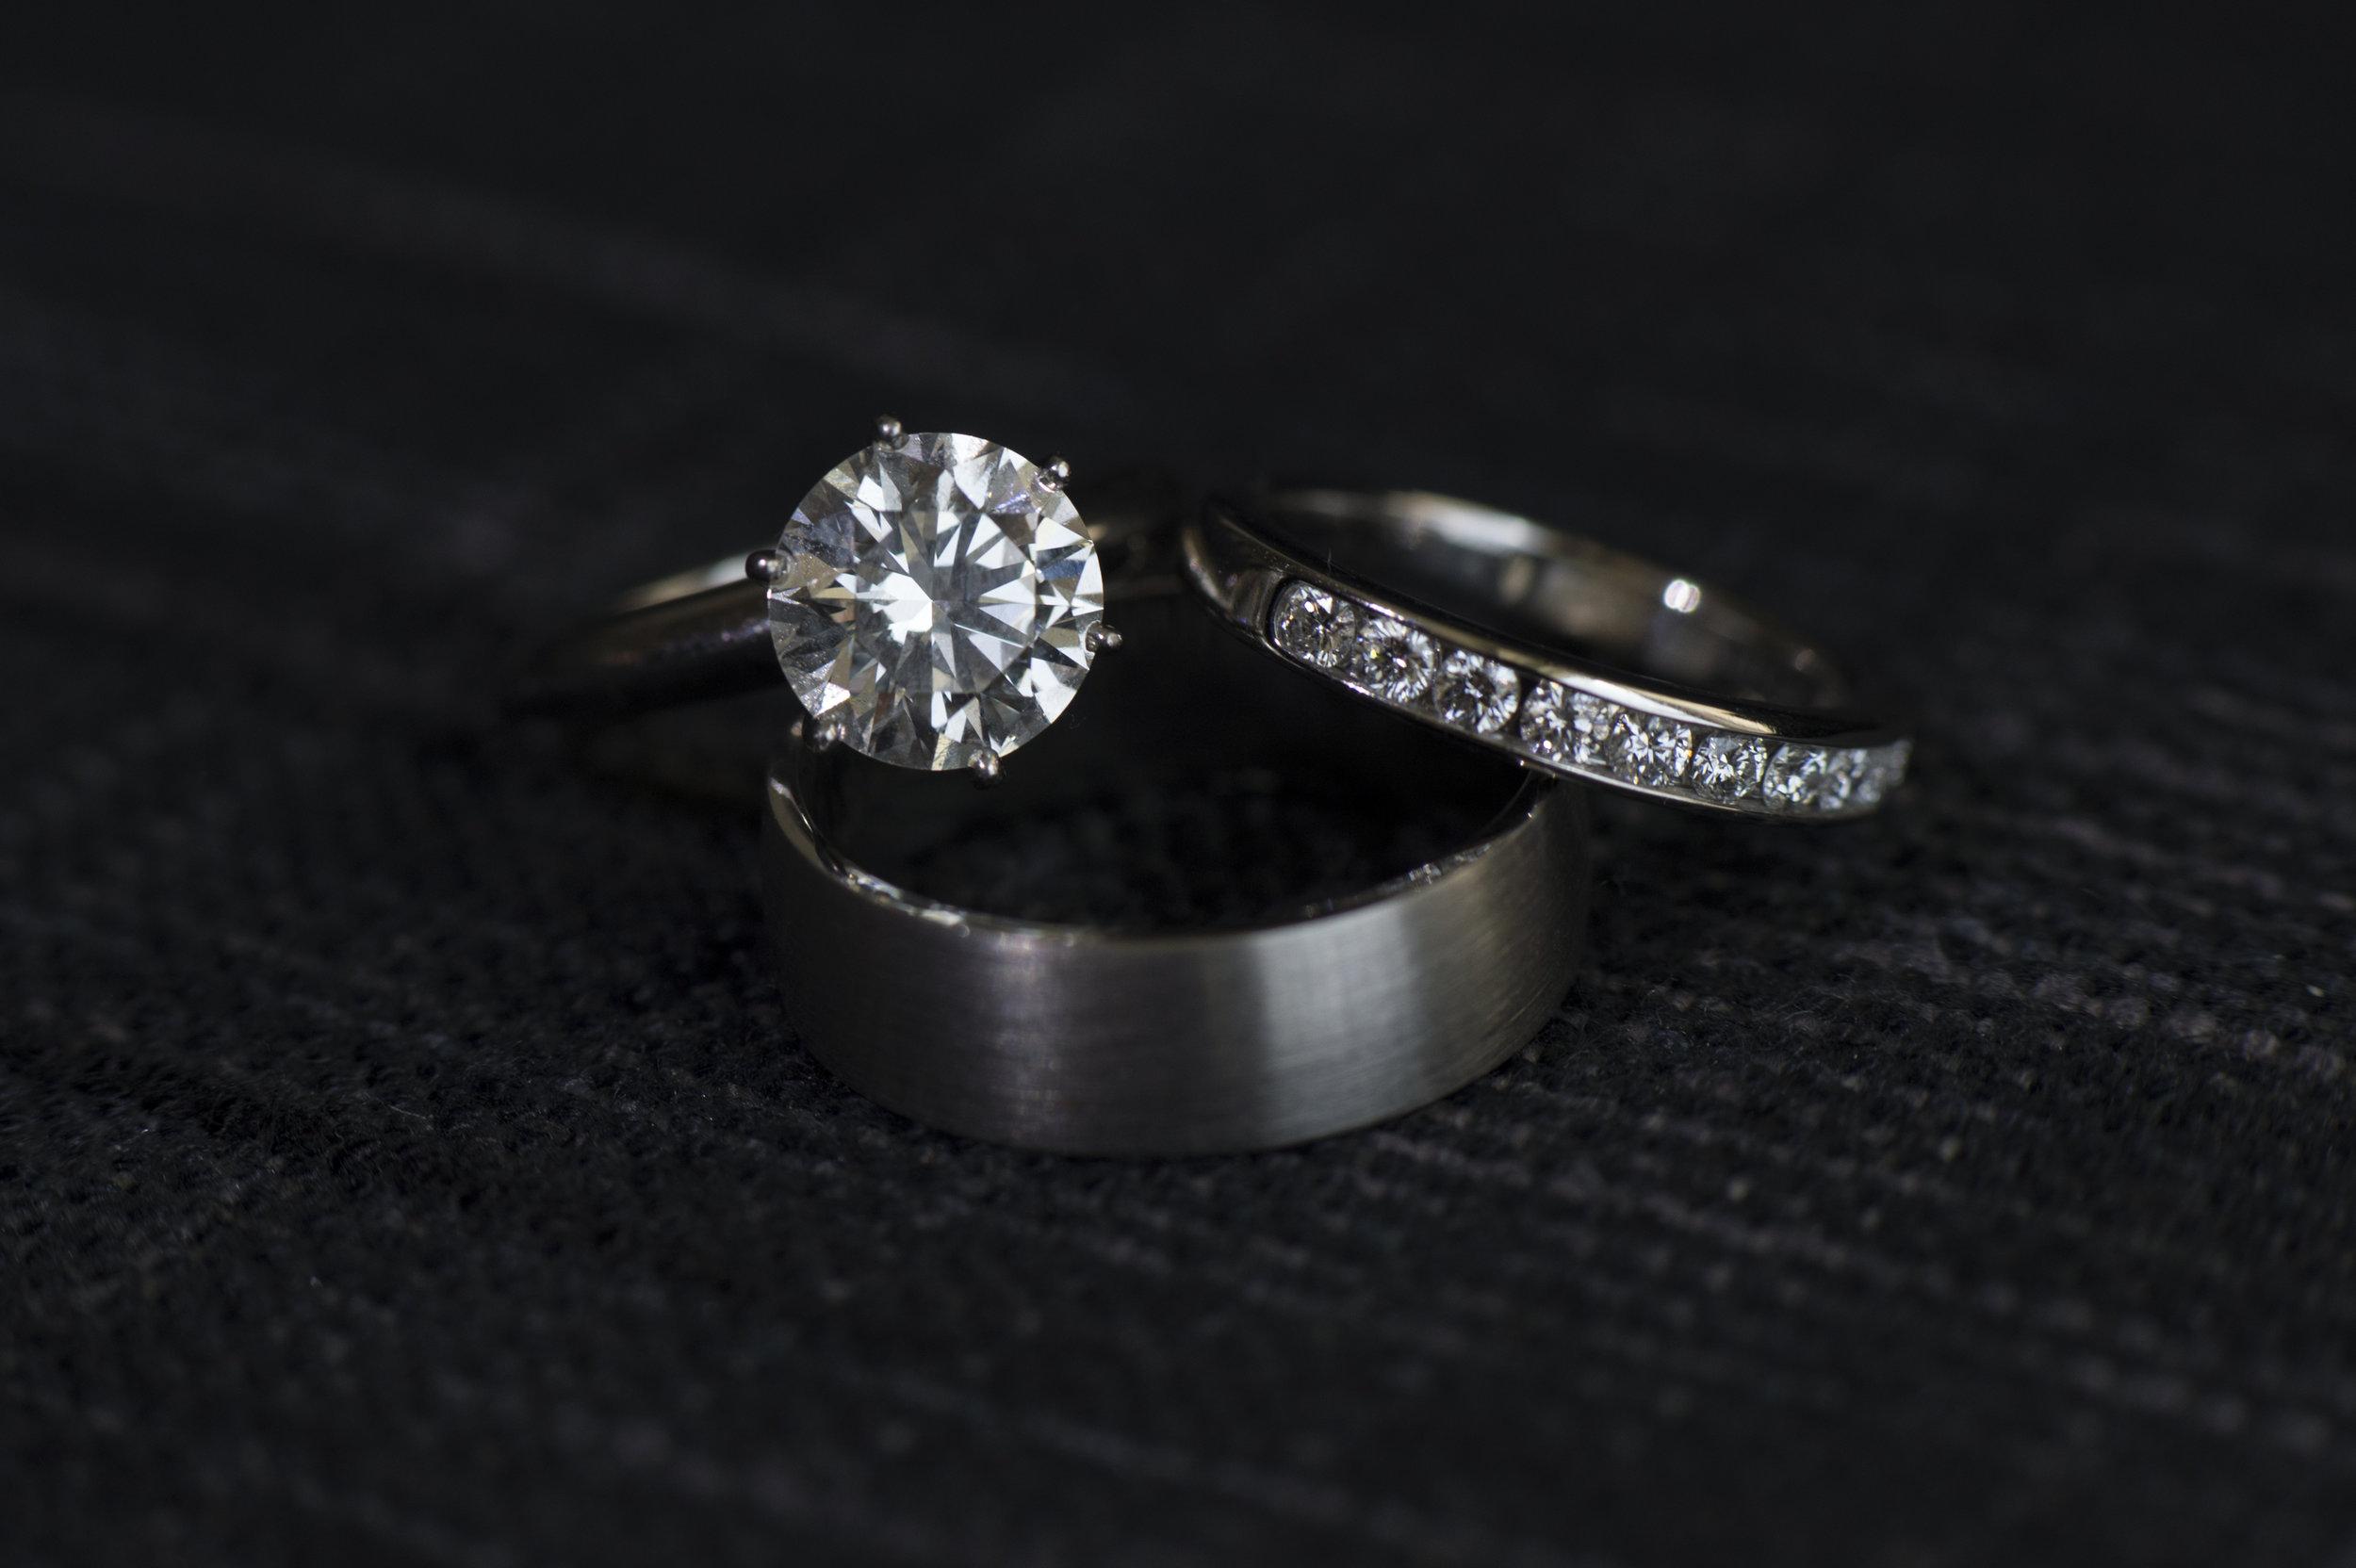 Wedding ing Photos - A Romantic Bel Air Bay Club Ocean-View Wedding - Southern California Wedding - Kevin Dinh Photography